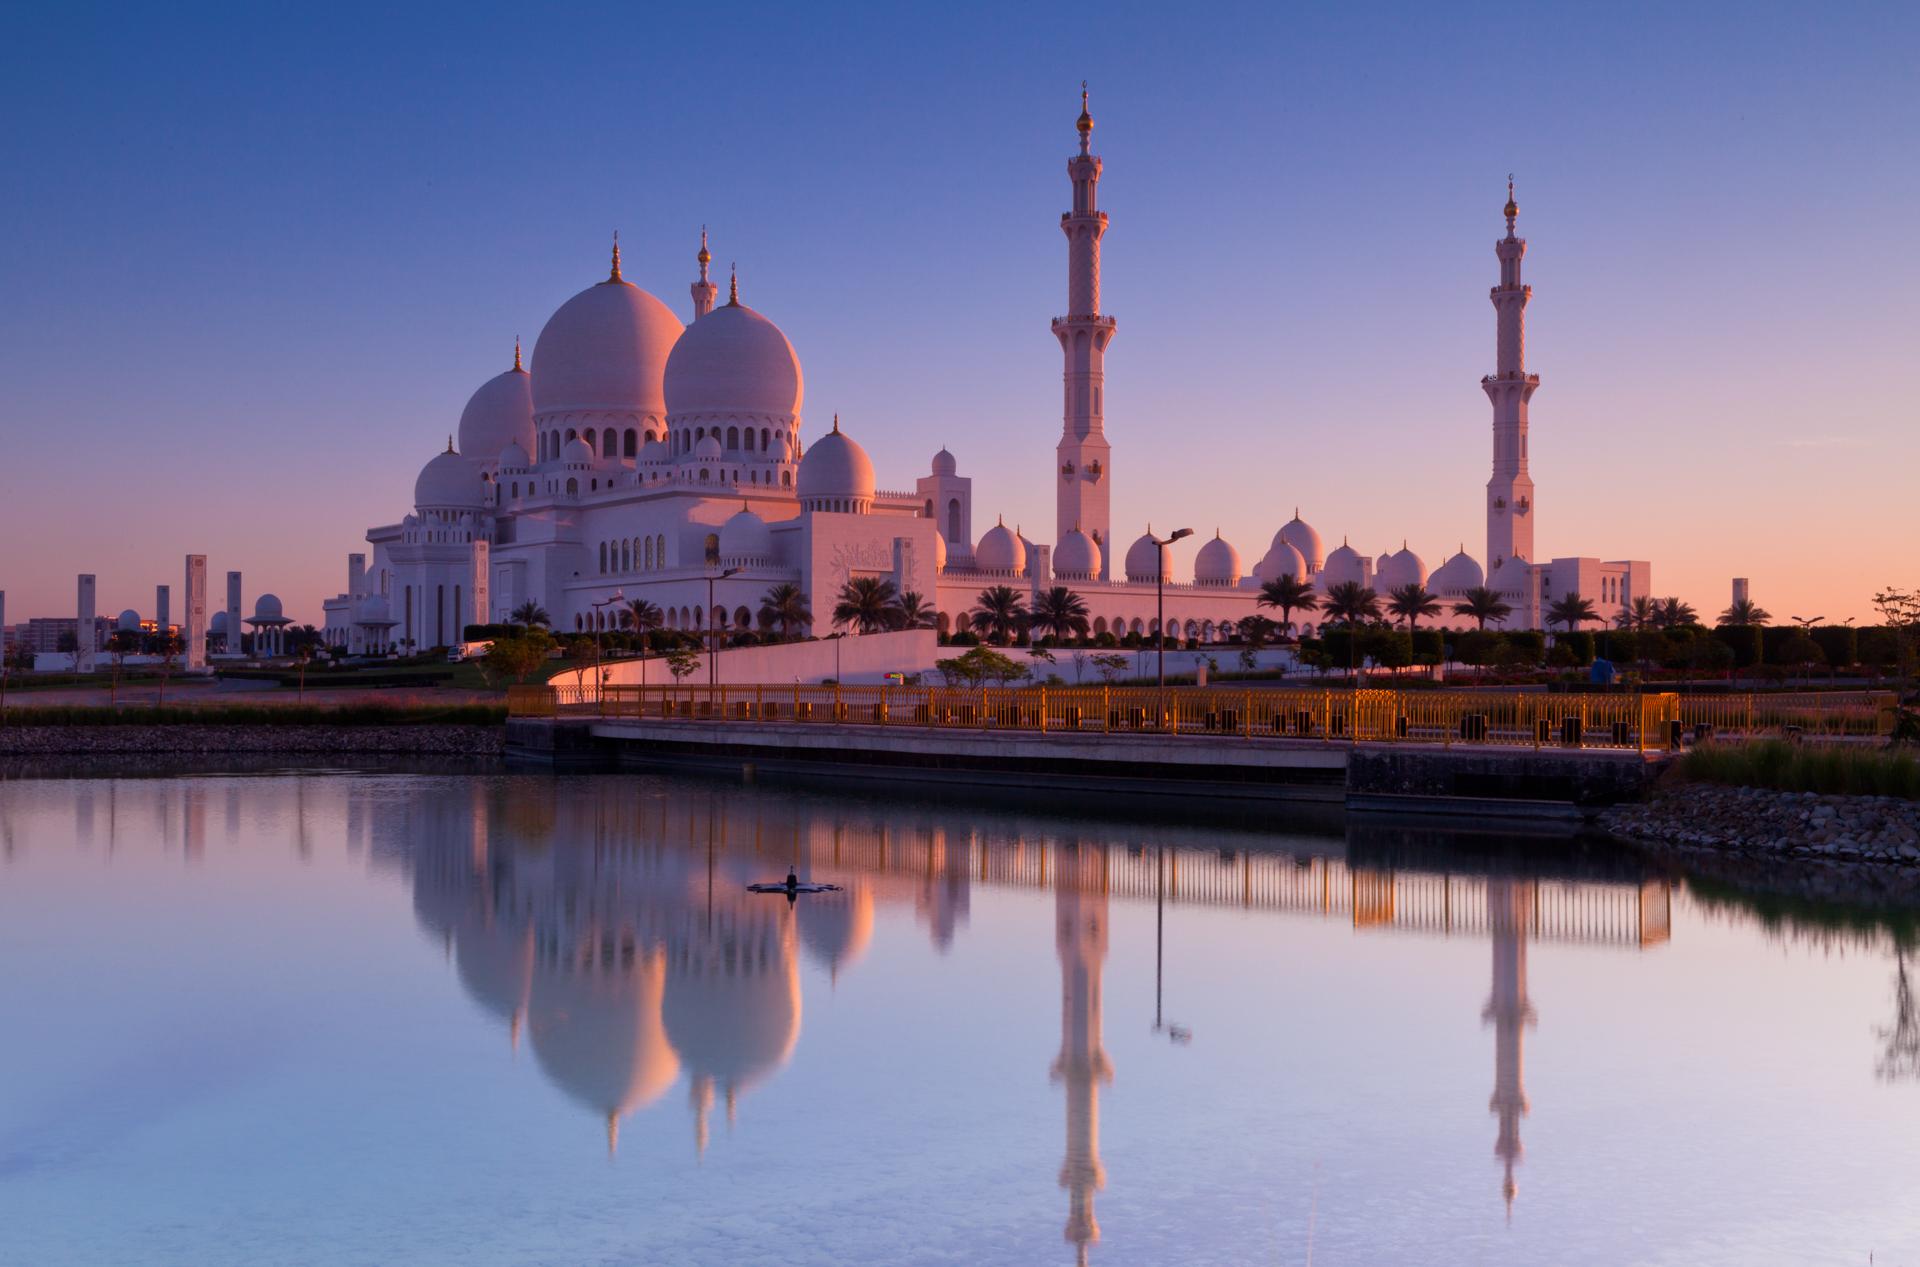 Dawn at the Sheikh Zayed Grand Mosque, Abu Dhabi.